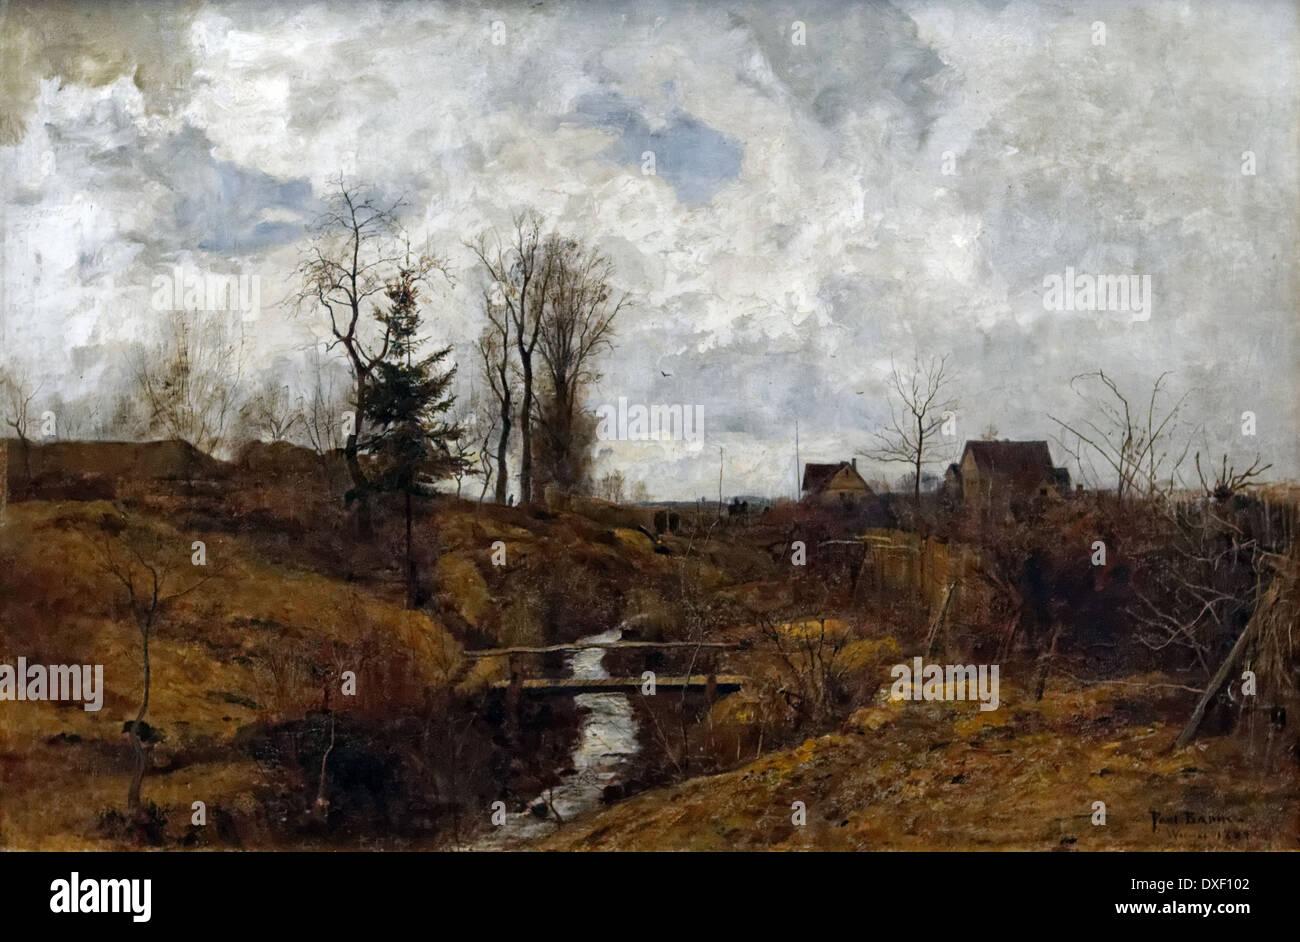 Paul Baum - After the Rain - 1883 - XIX th century - German school - Alte Nationalgalerie - Berlin - Stock Image